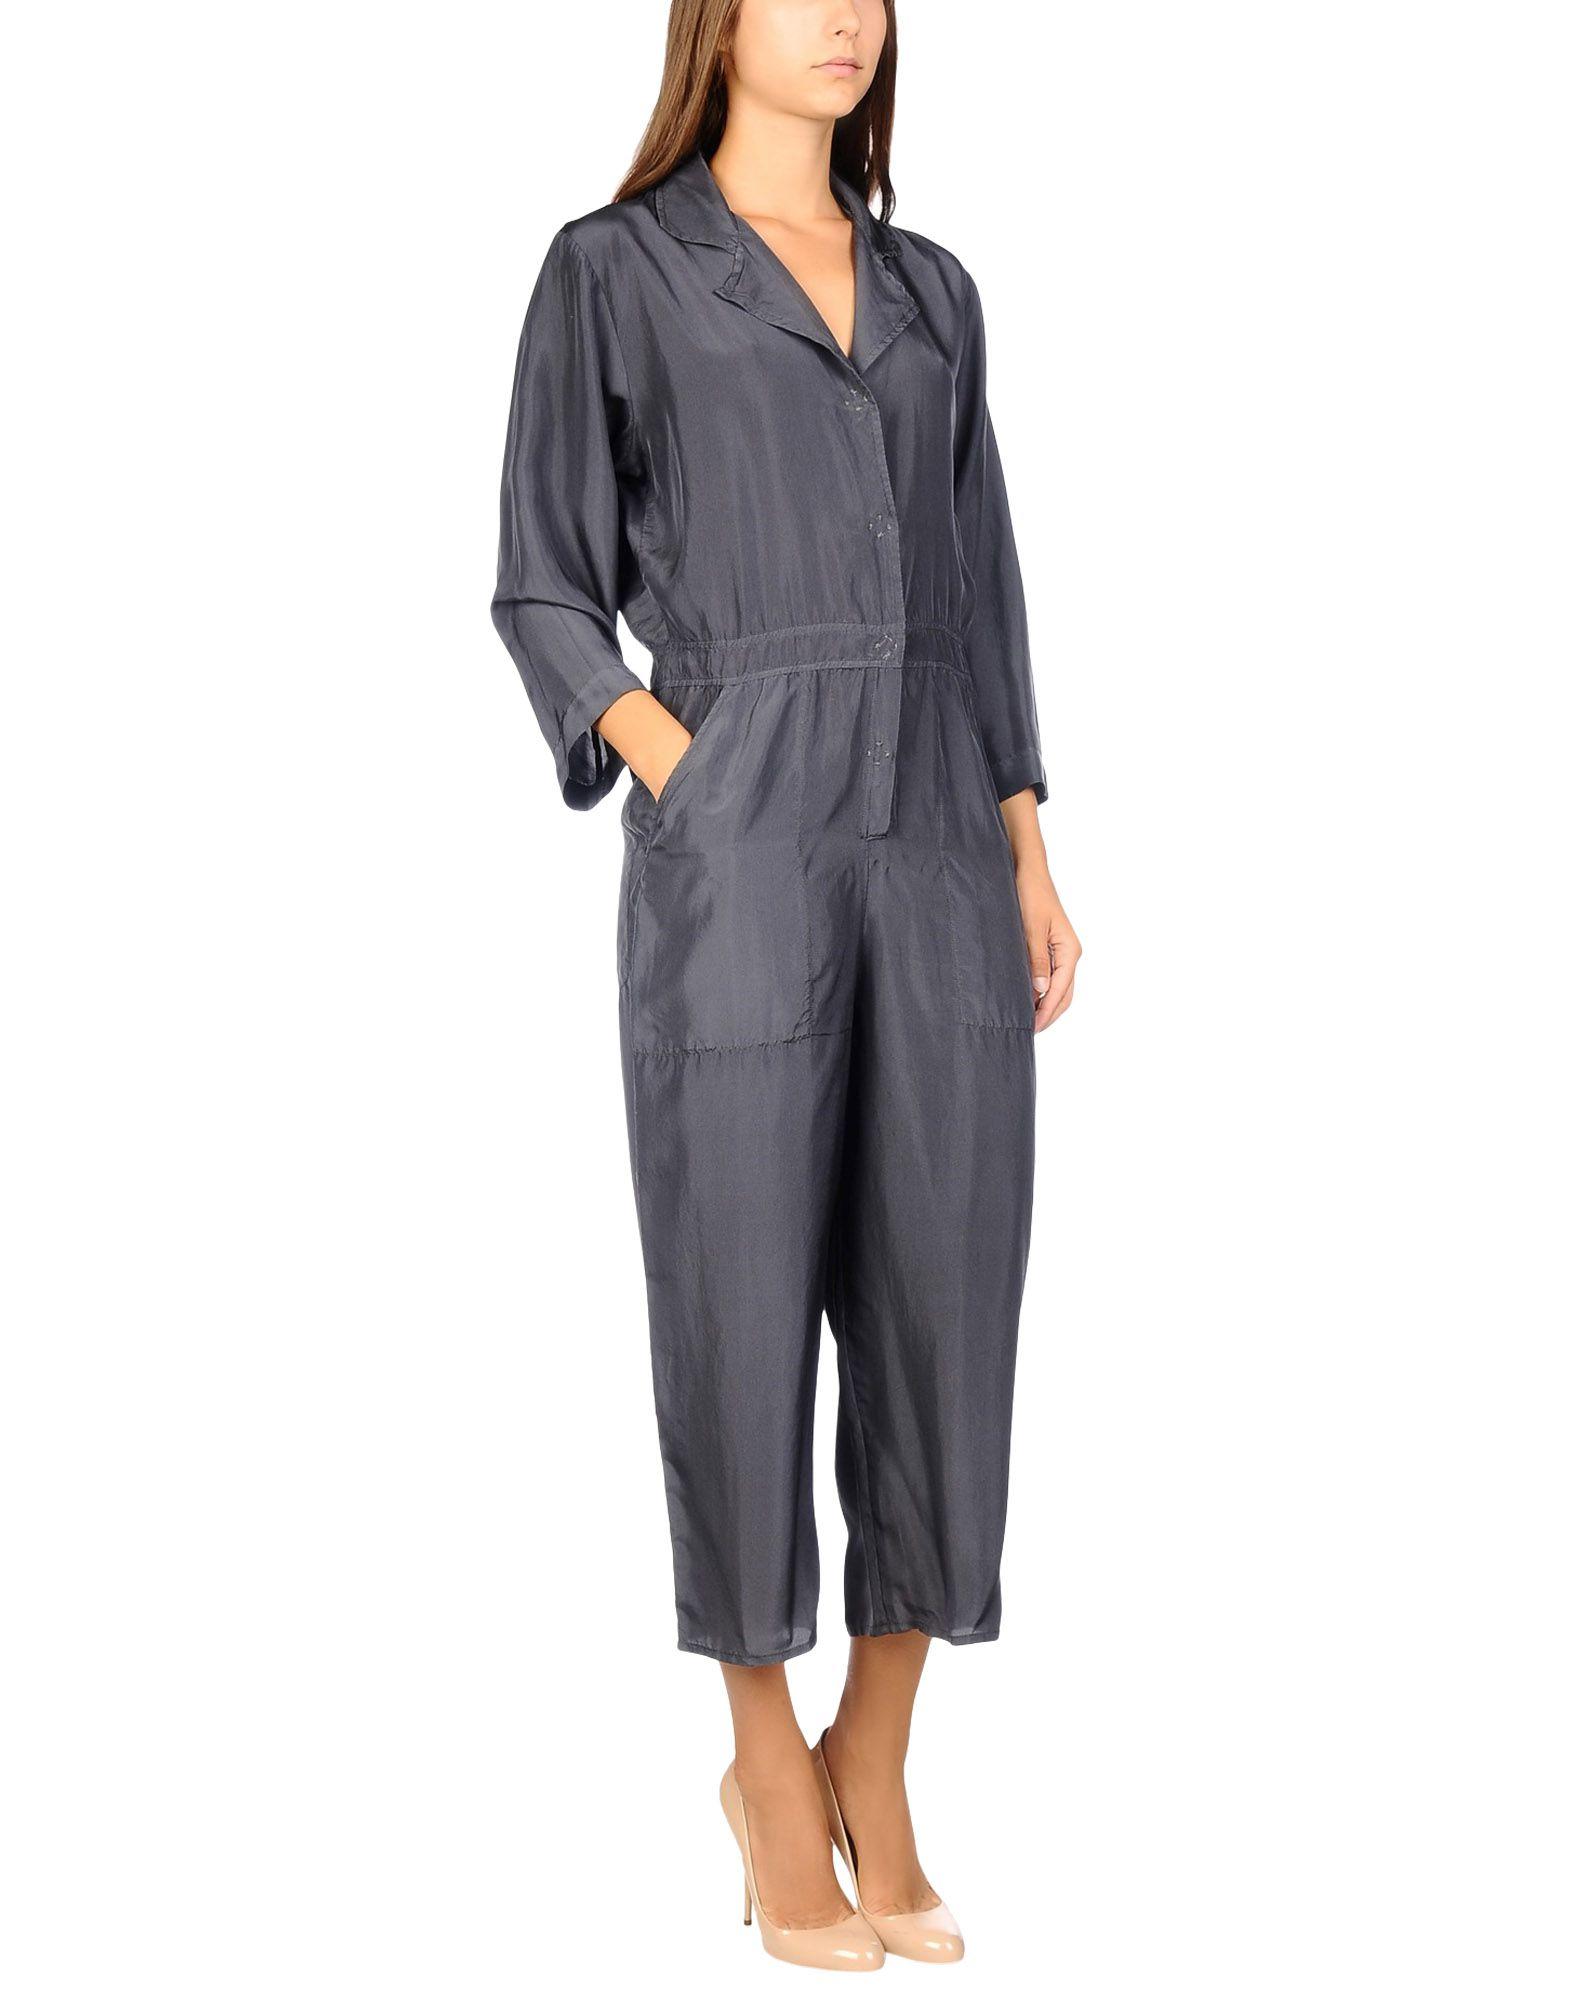 Robes En Femme Ligne Grazia'lliani BientôtAcheter 34q5jSARcL